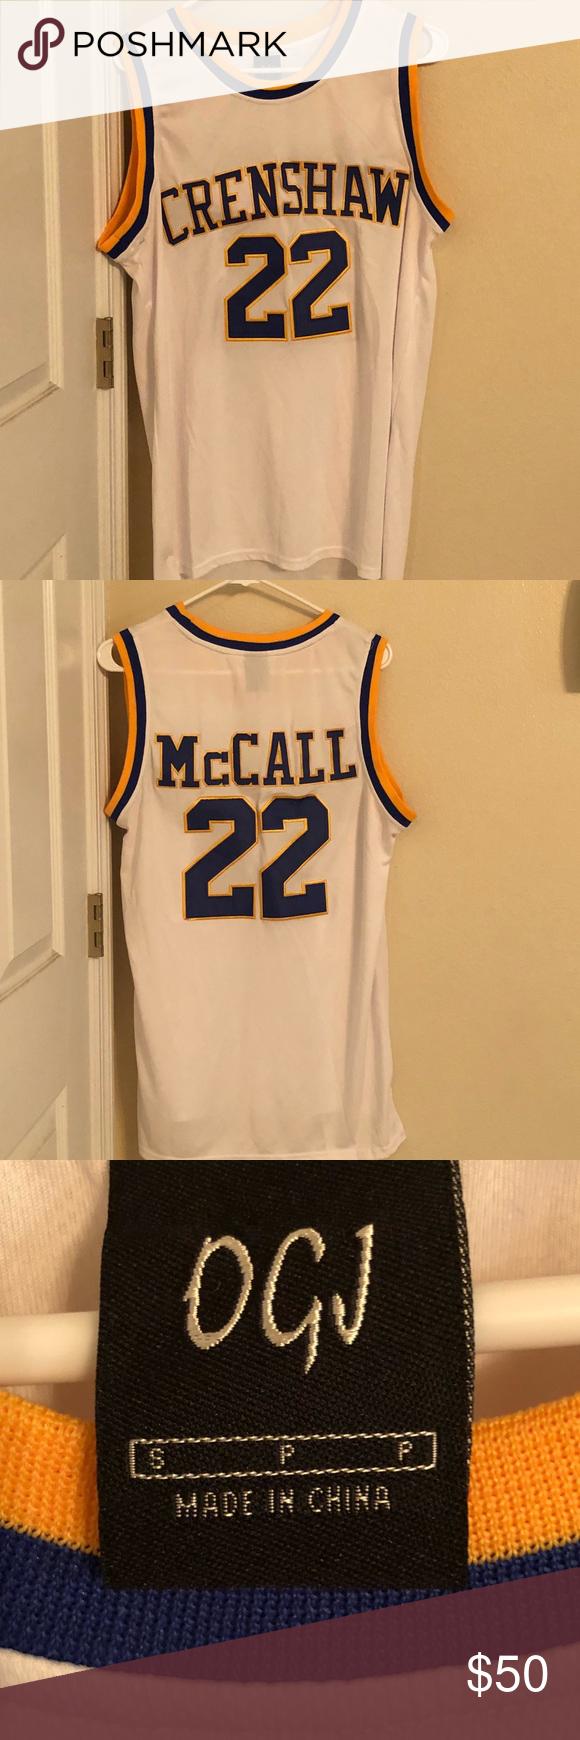 e57def5b109 Love and basketball Quincy McCall jersey Love and basketball Quincy McCall  Crenshaw High basketball jersey runs big worn once Shirts Tank Tops